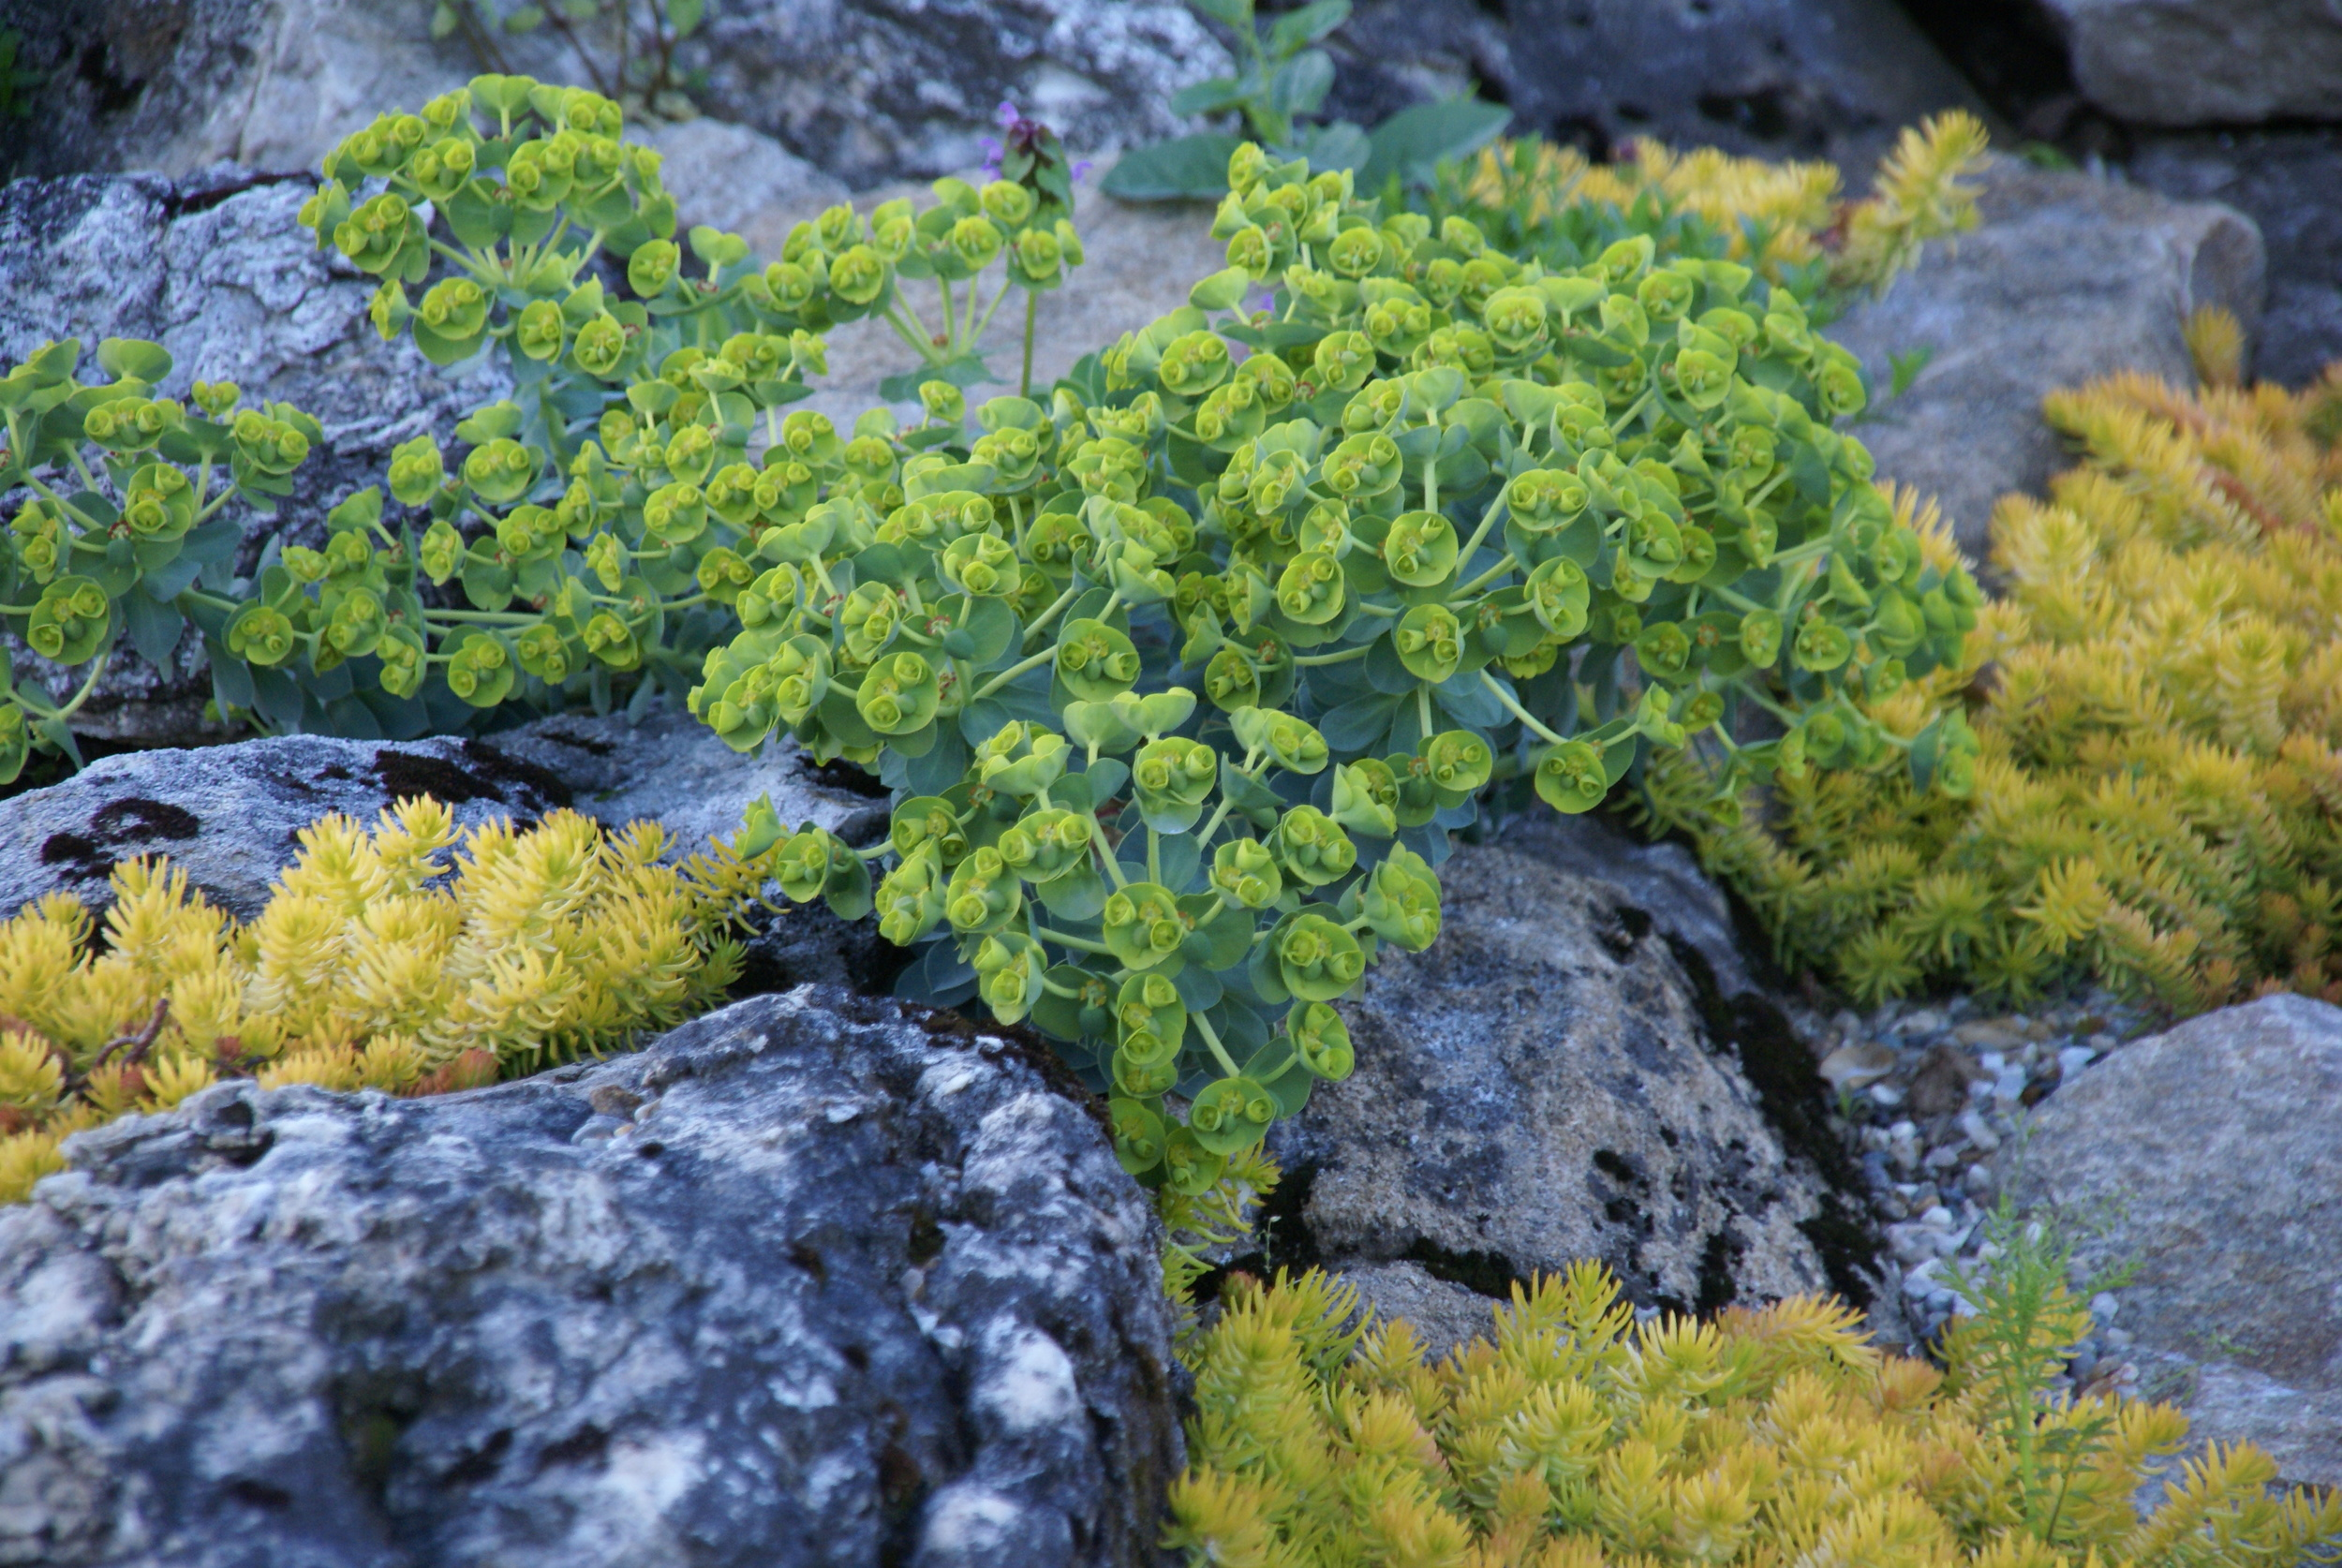 Euphorbia with sedum amid stones